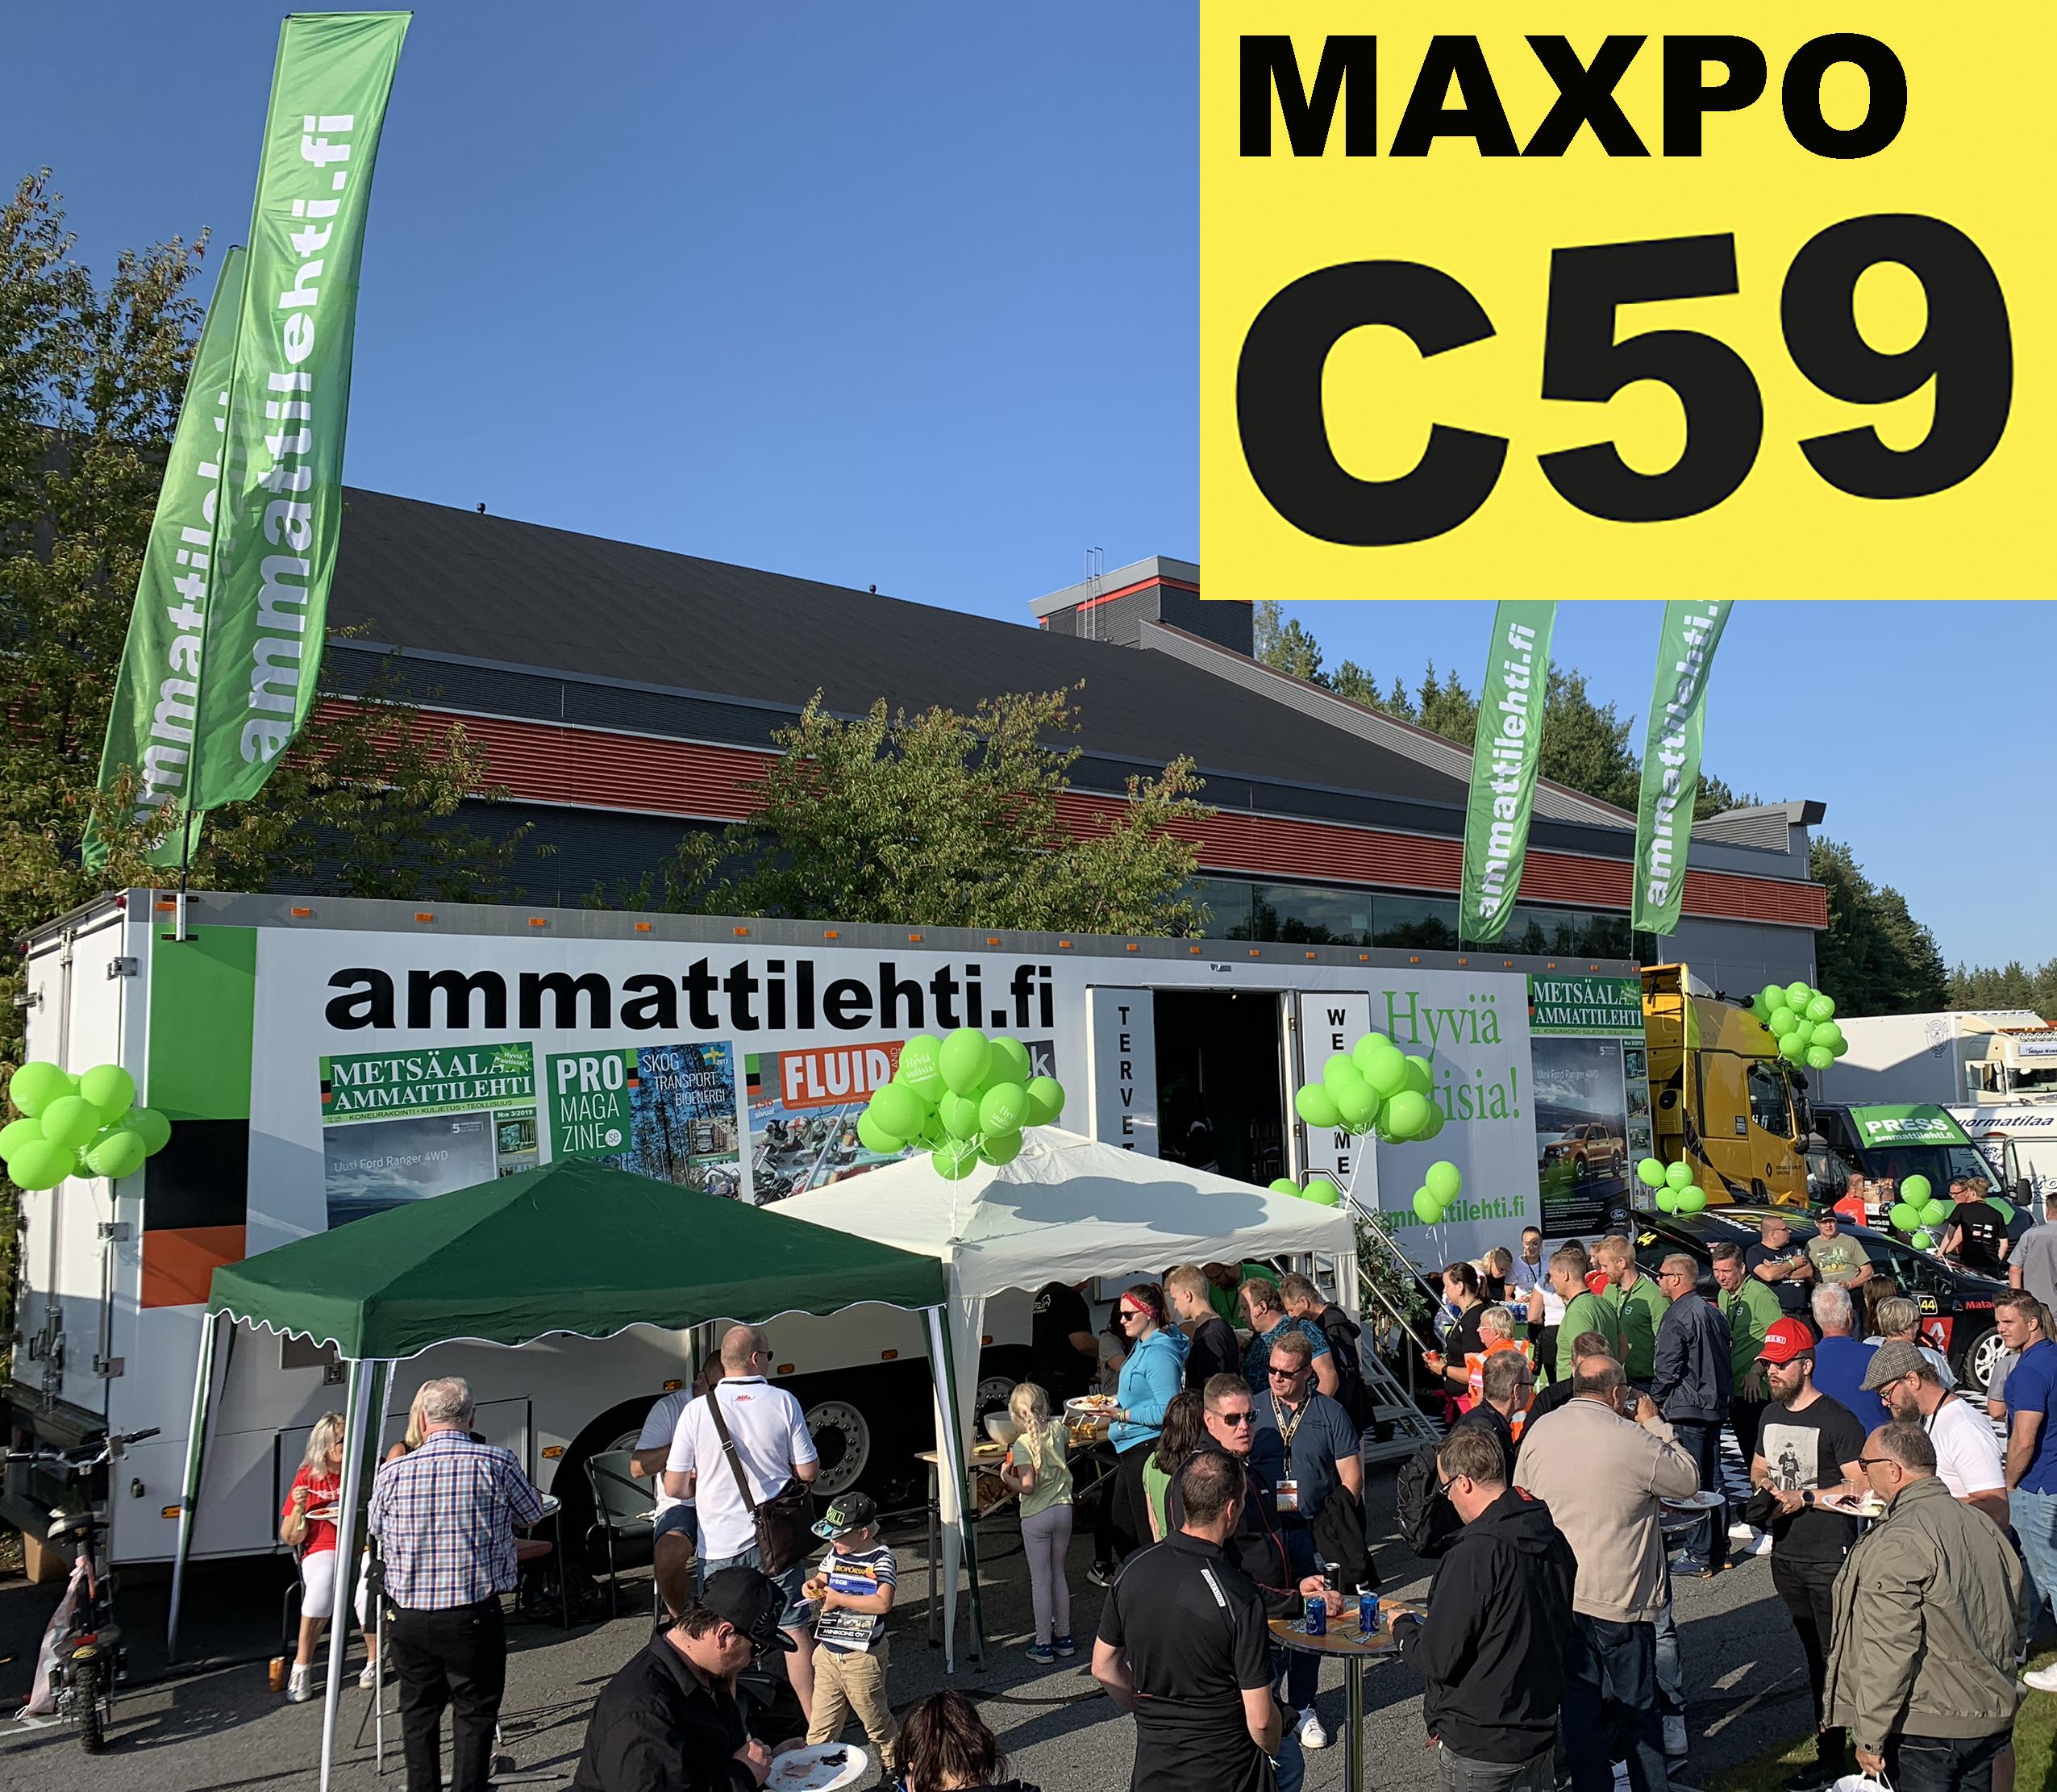 c59maxpo0.jpg